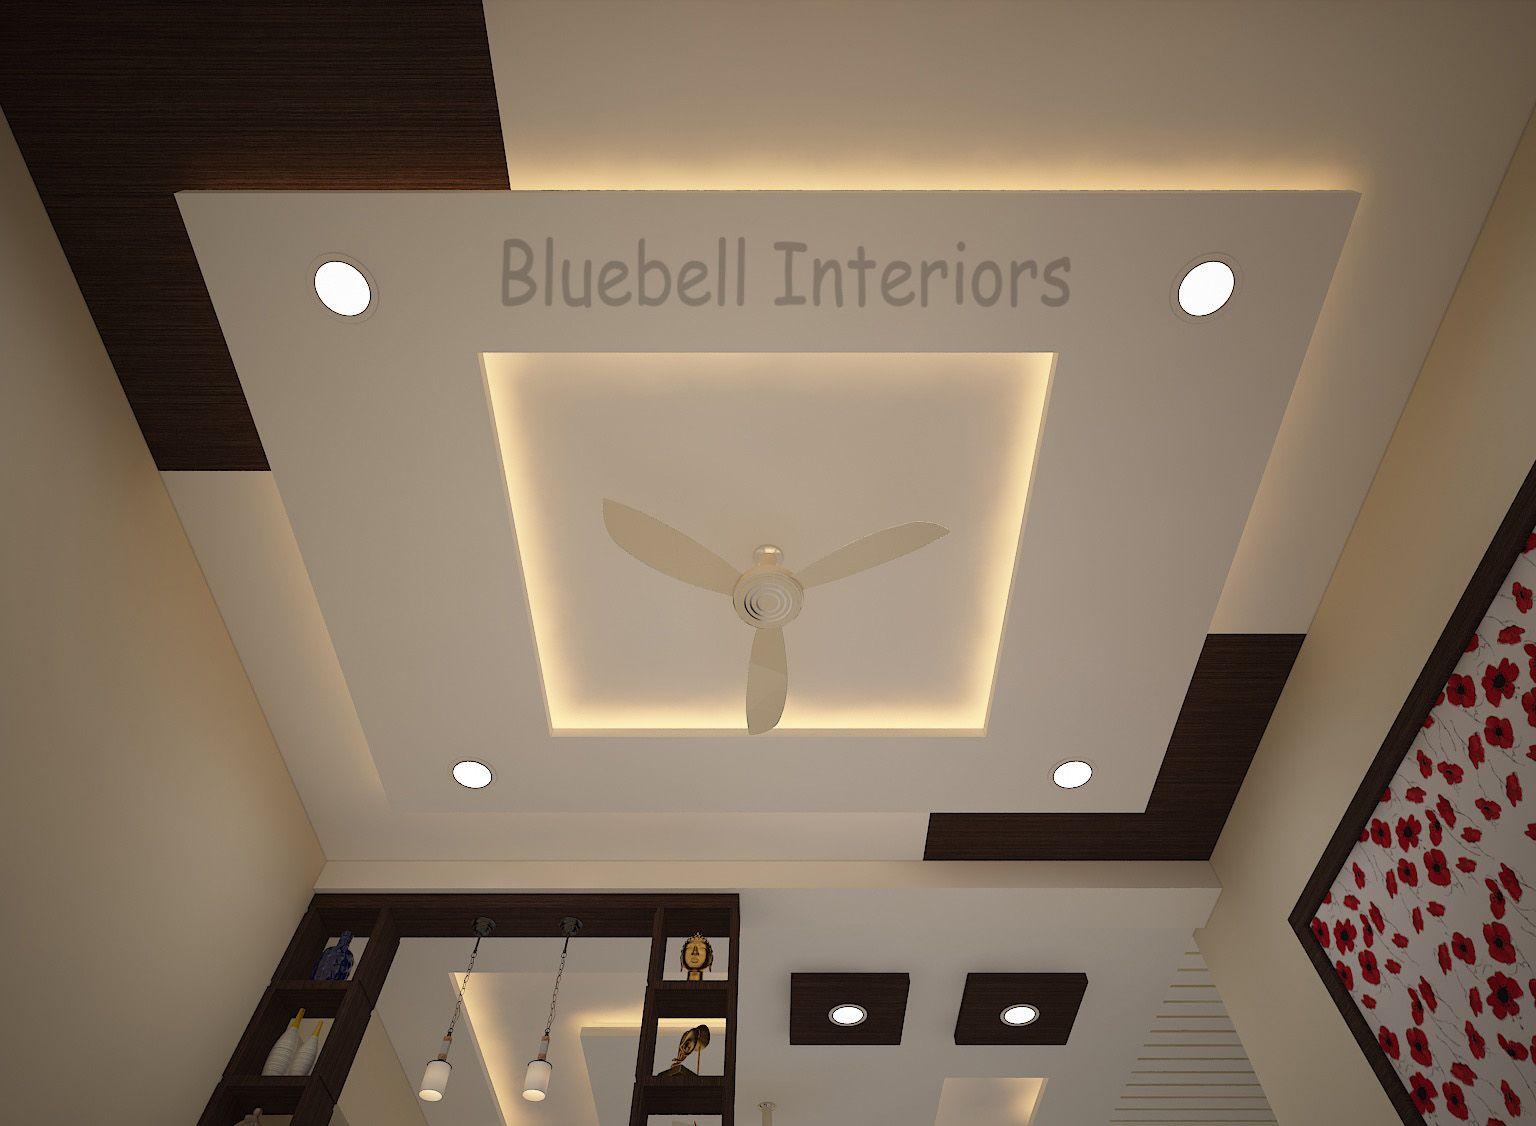 Bedroom False Ceiling Gypsum Ceiling Lighting Design In 2020 House Ceiling Design False Ceiling Design Bedroom False Ceiling Design